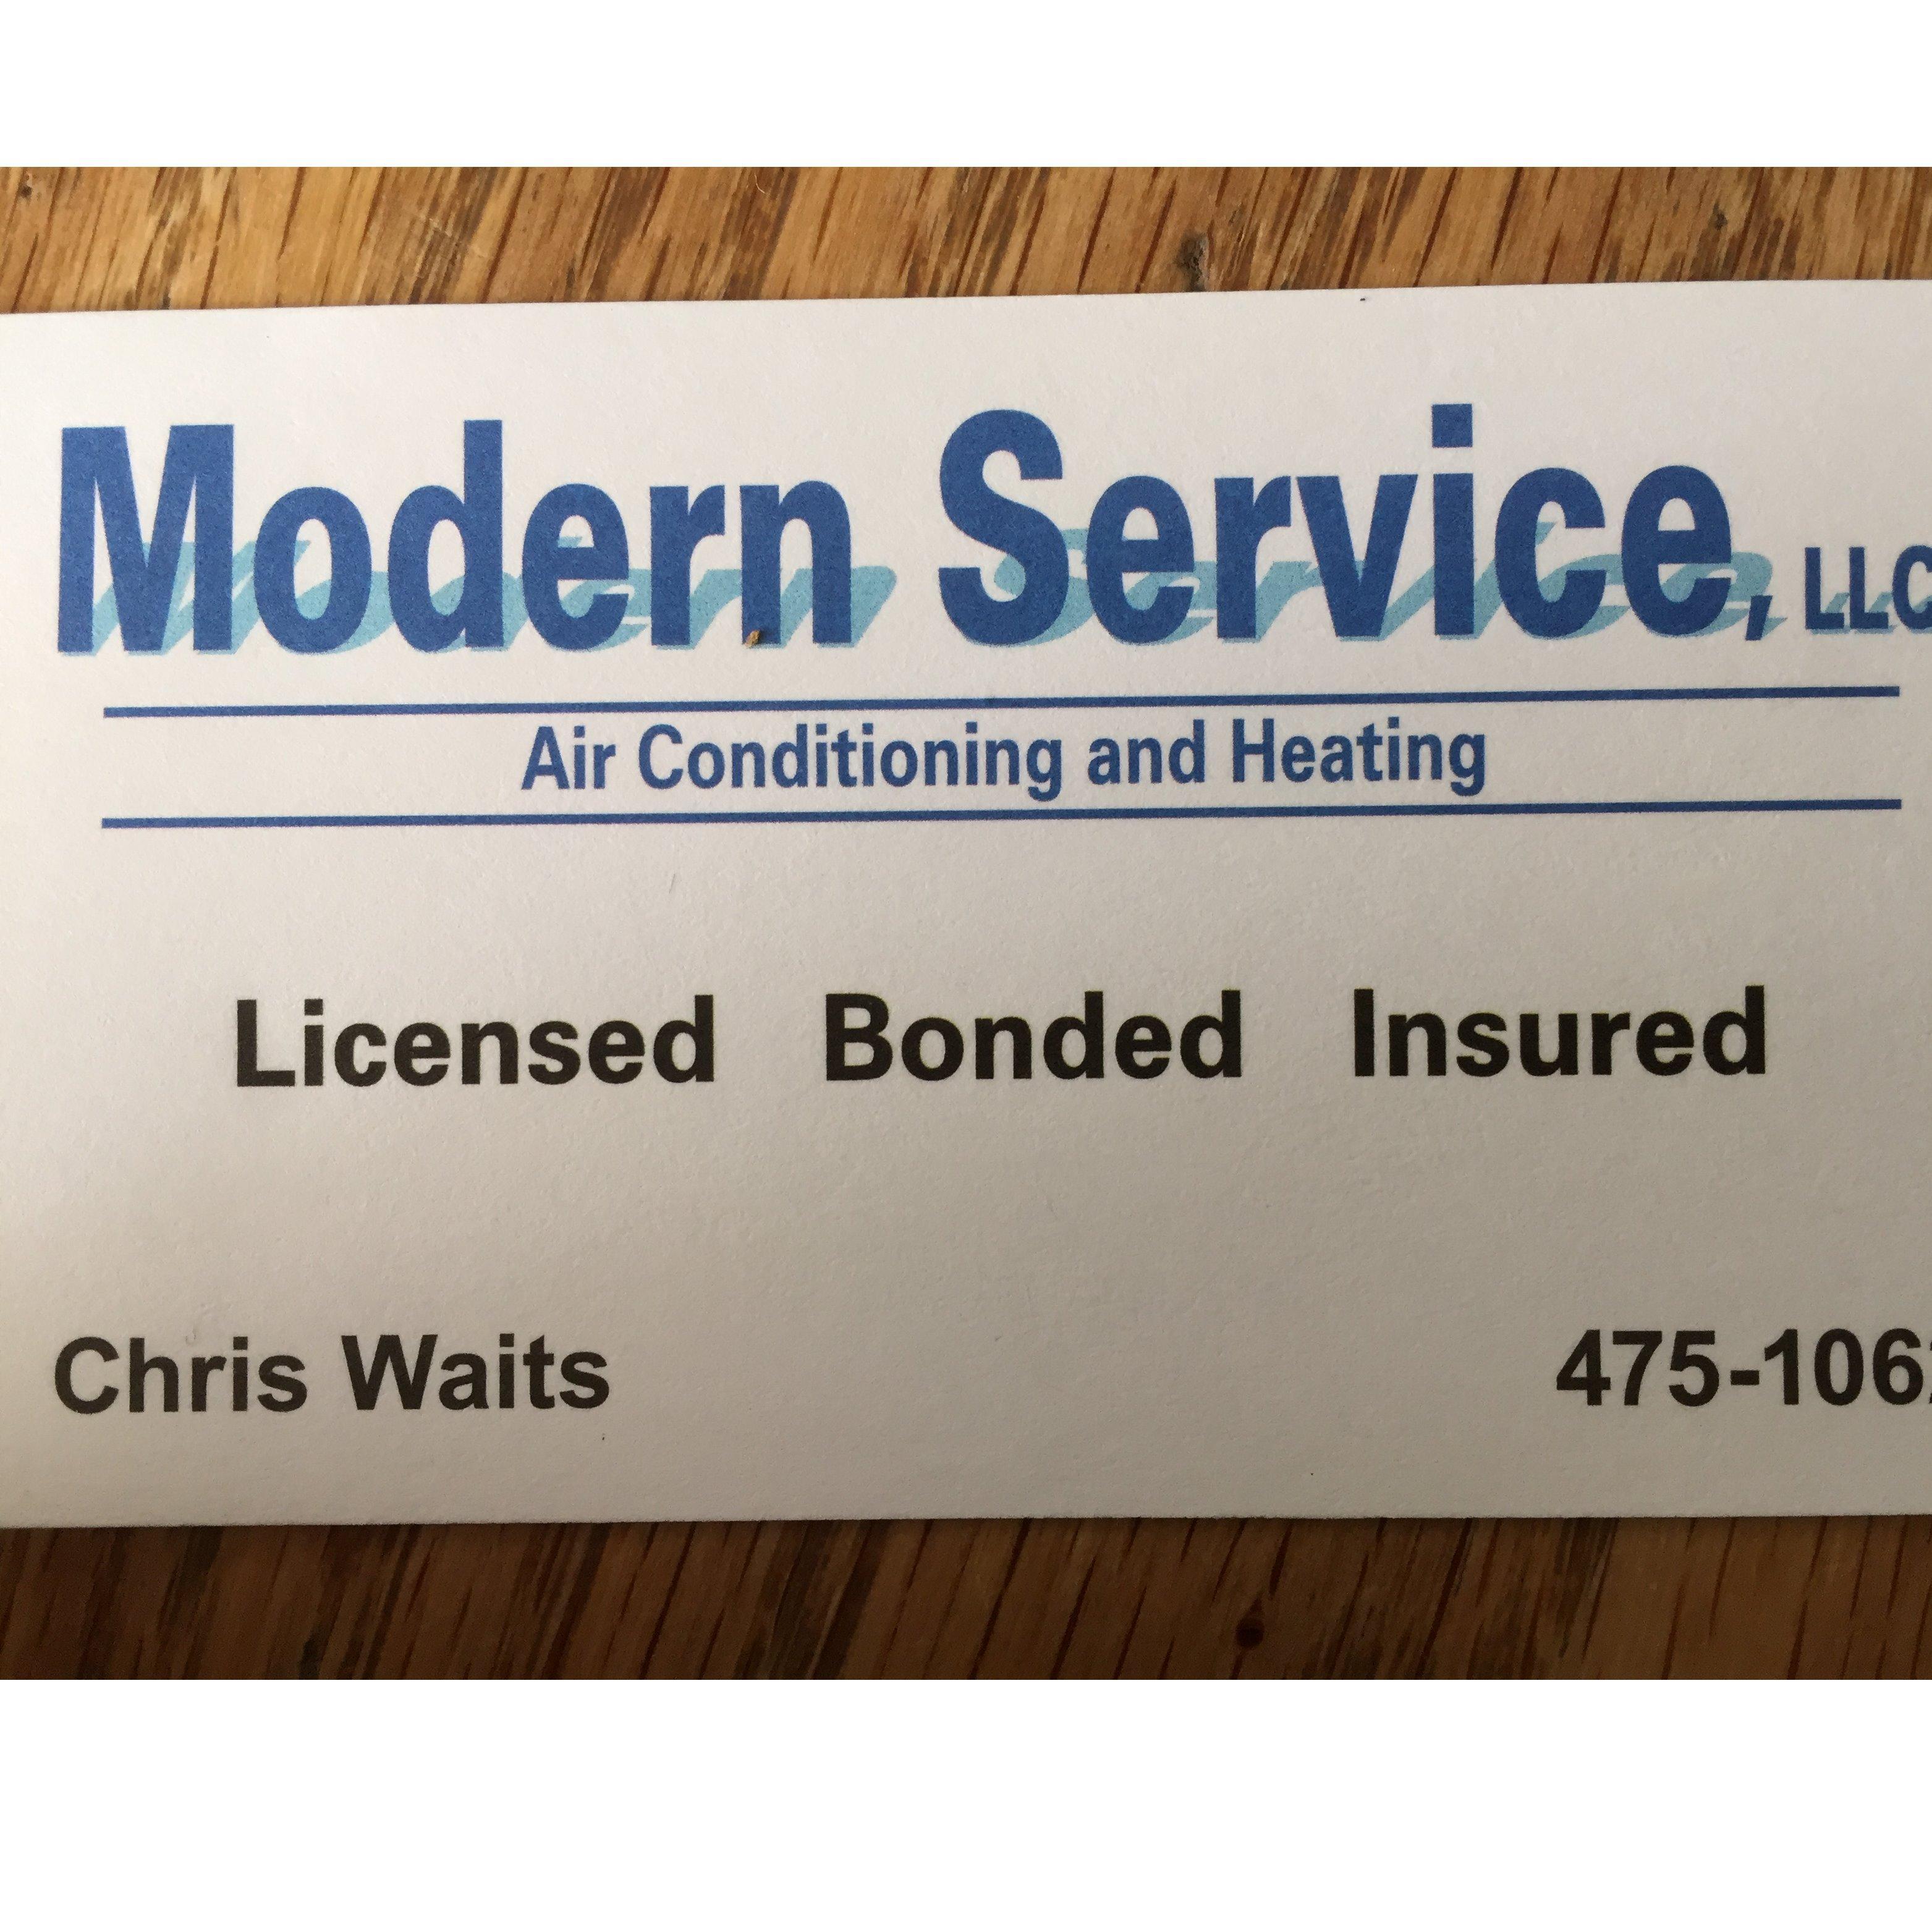 Modern Service Llc